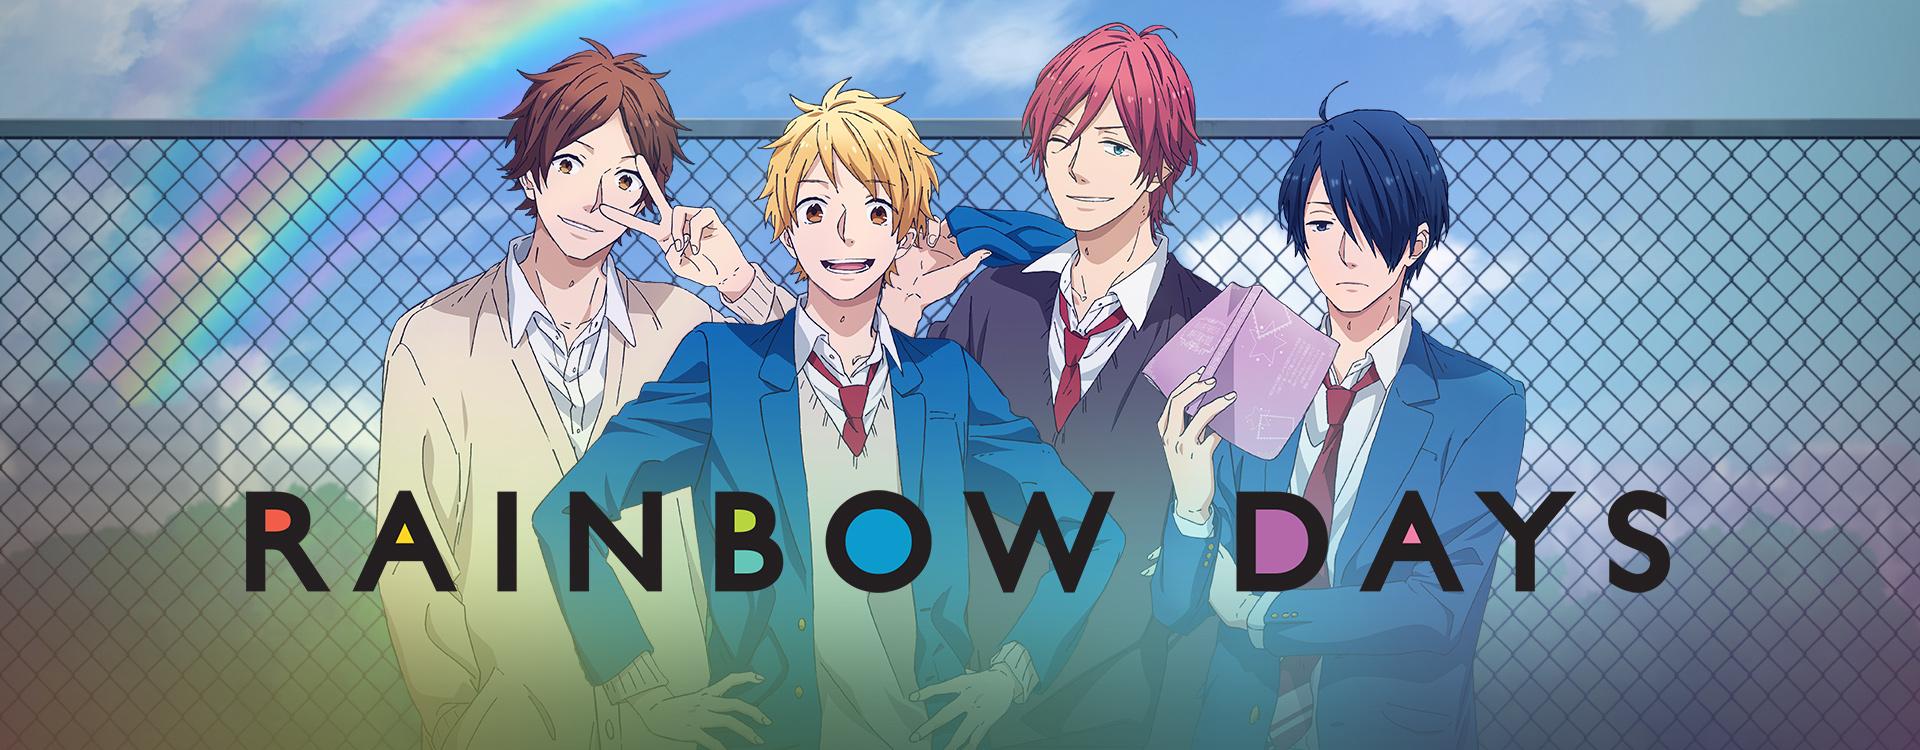 Watch Rainbow Days Episodes Sub & Dub | Comedy, Romance, Slice of